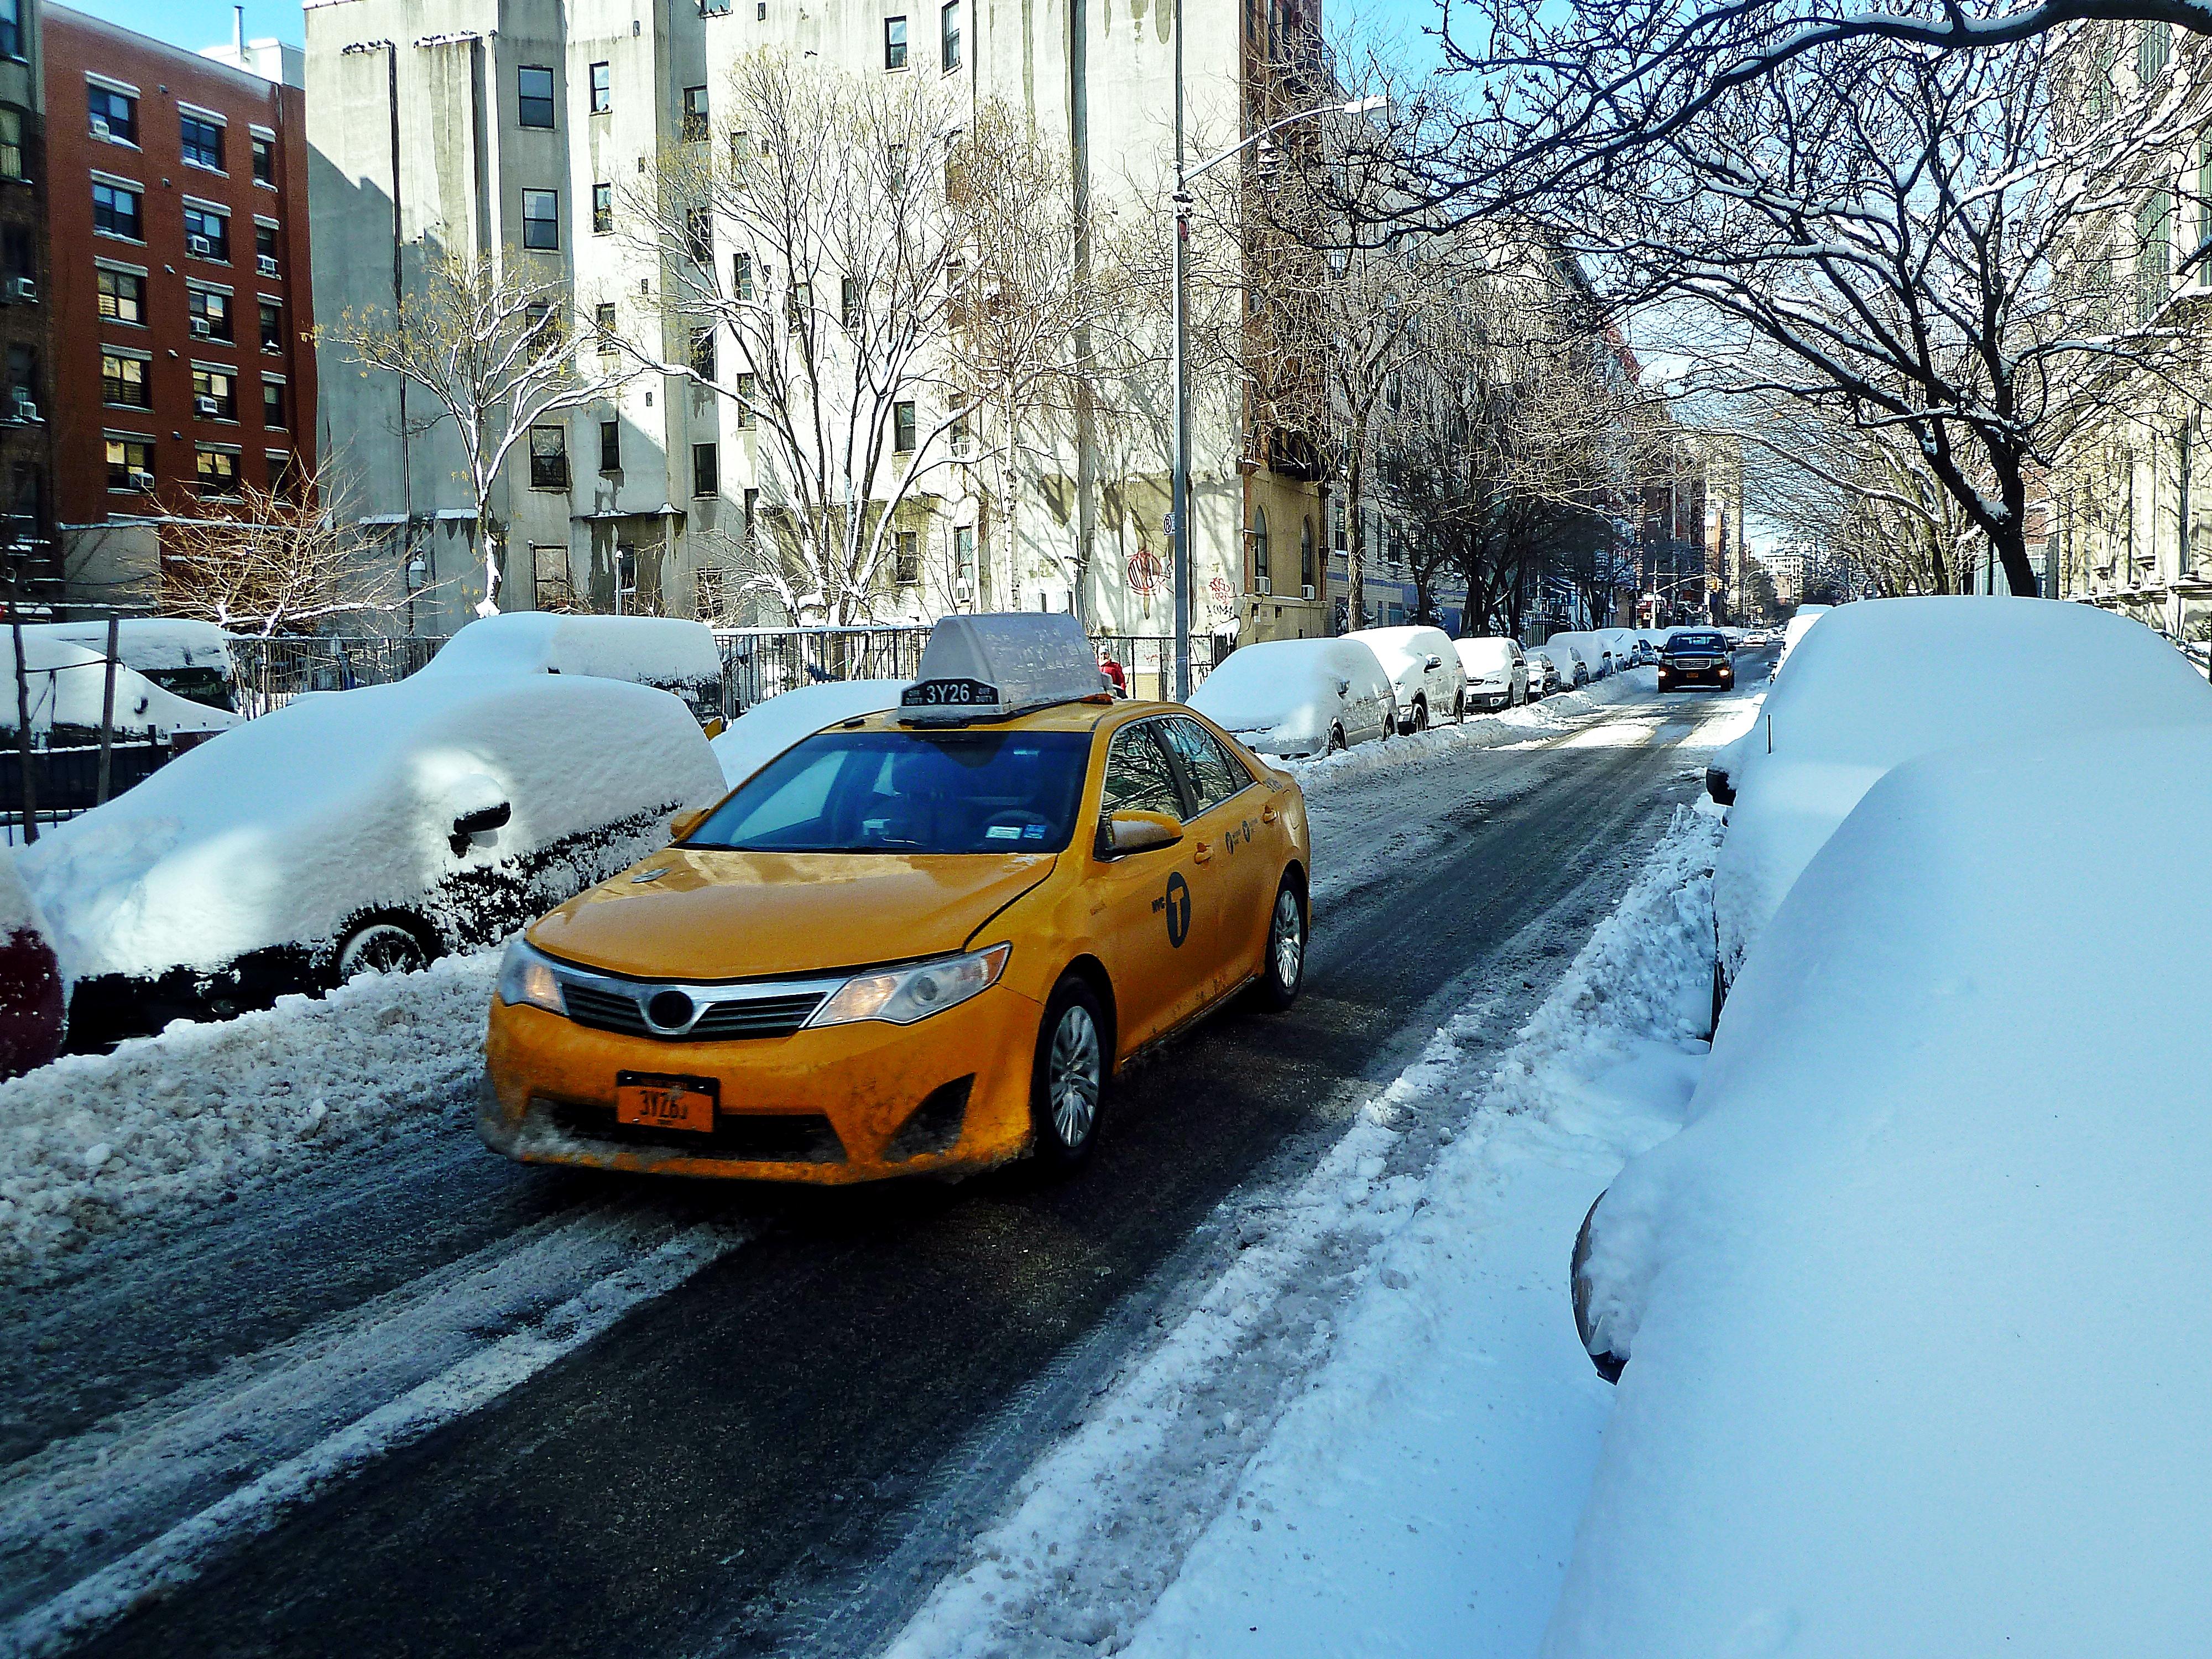 Description New York Blizzard 2013 Snow.JPG